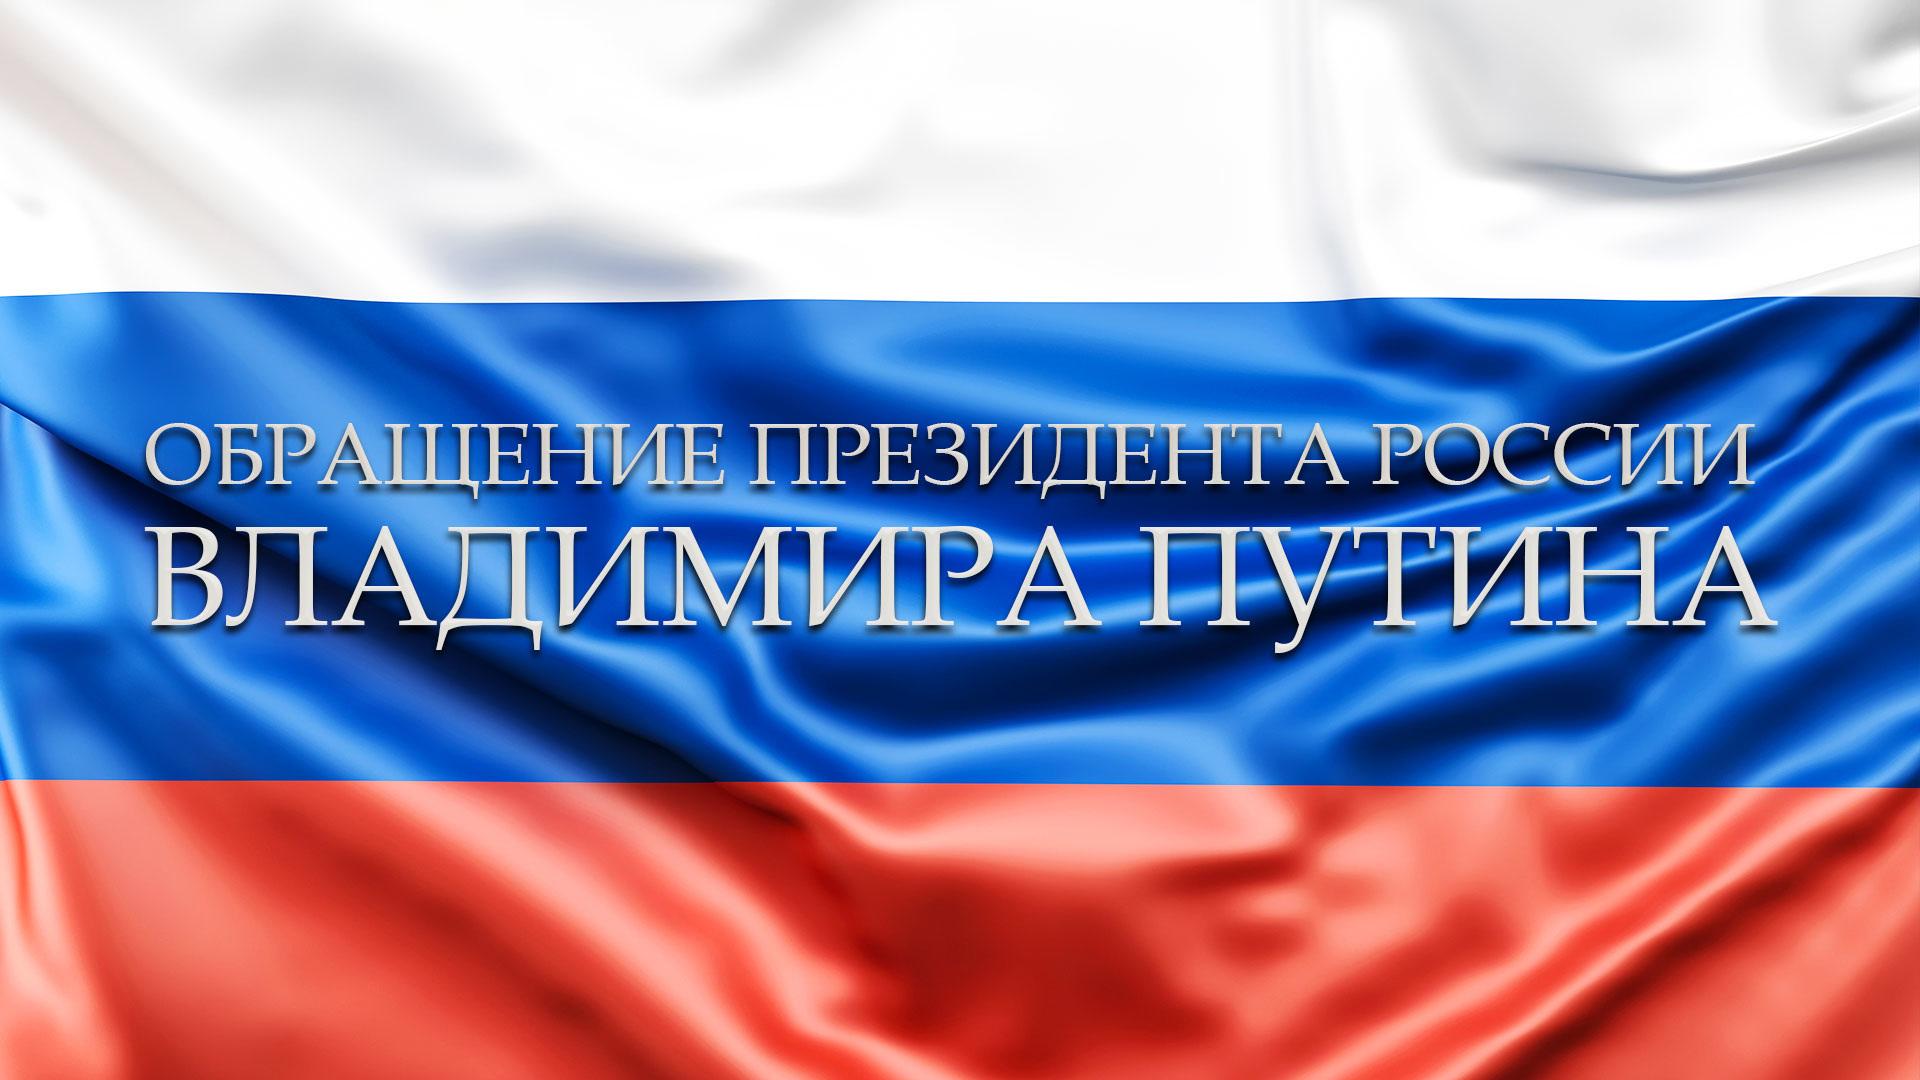 Обращение президента России Владимира Путина